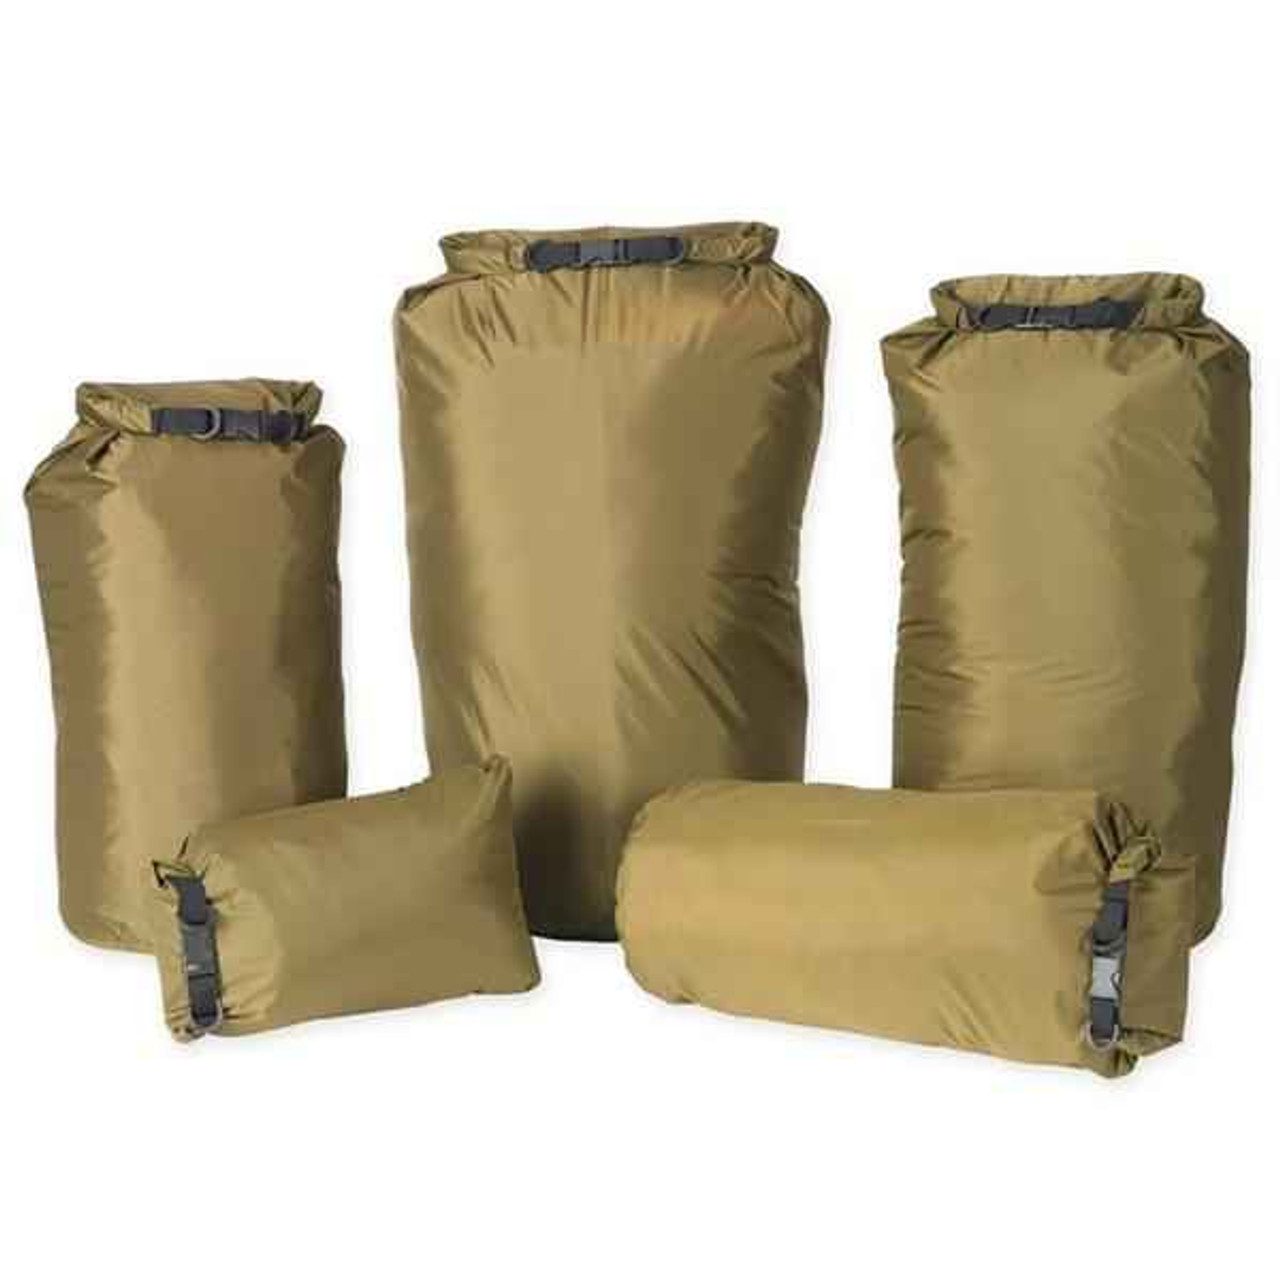 Pro Force Dri-Sak Waterproof Bag - X Large, Coyote